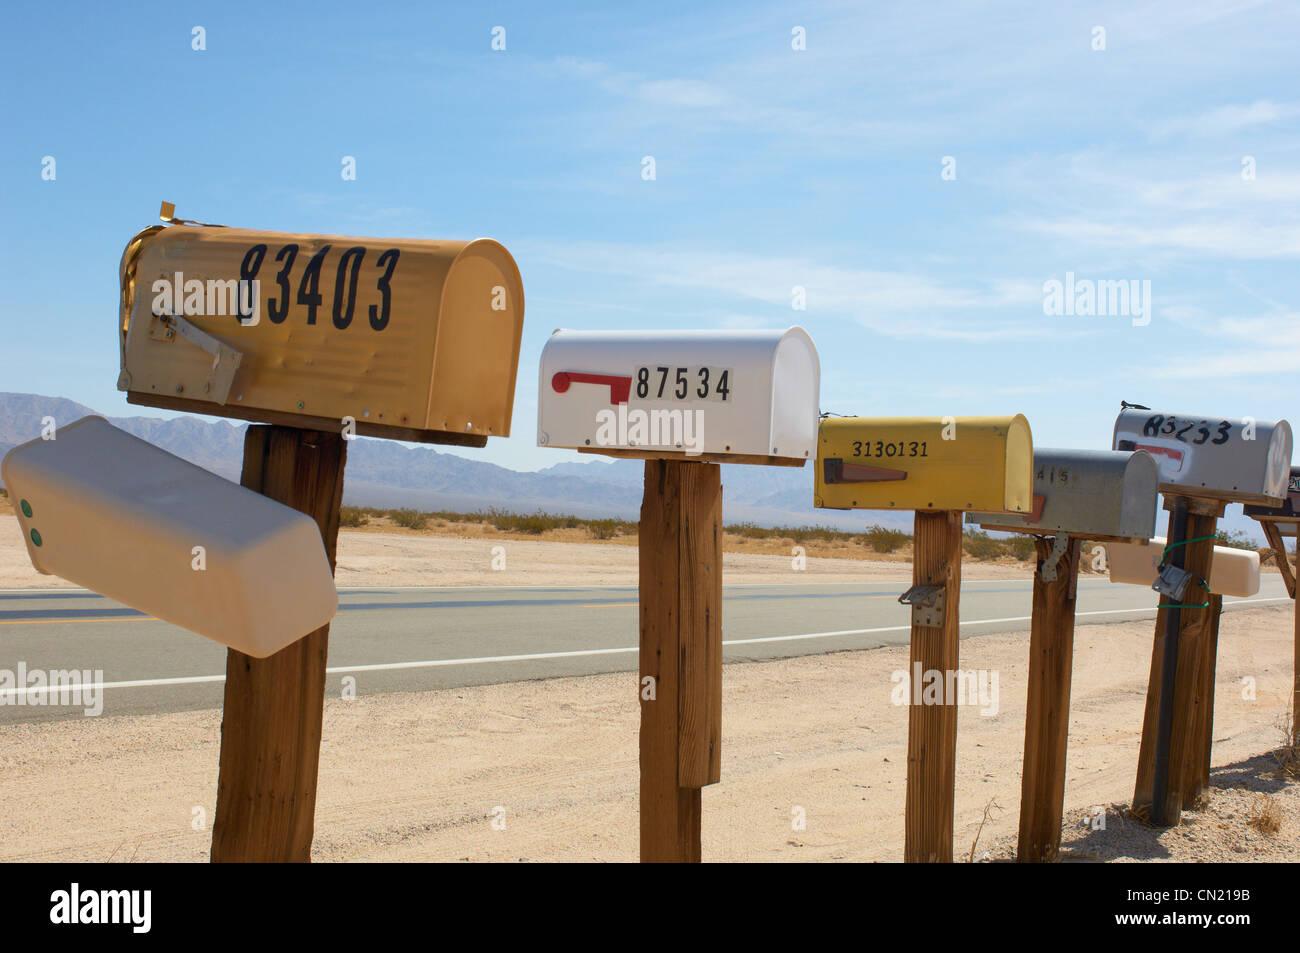 Mailboxes, Mojave Desert, California, USA - Stock Image